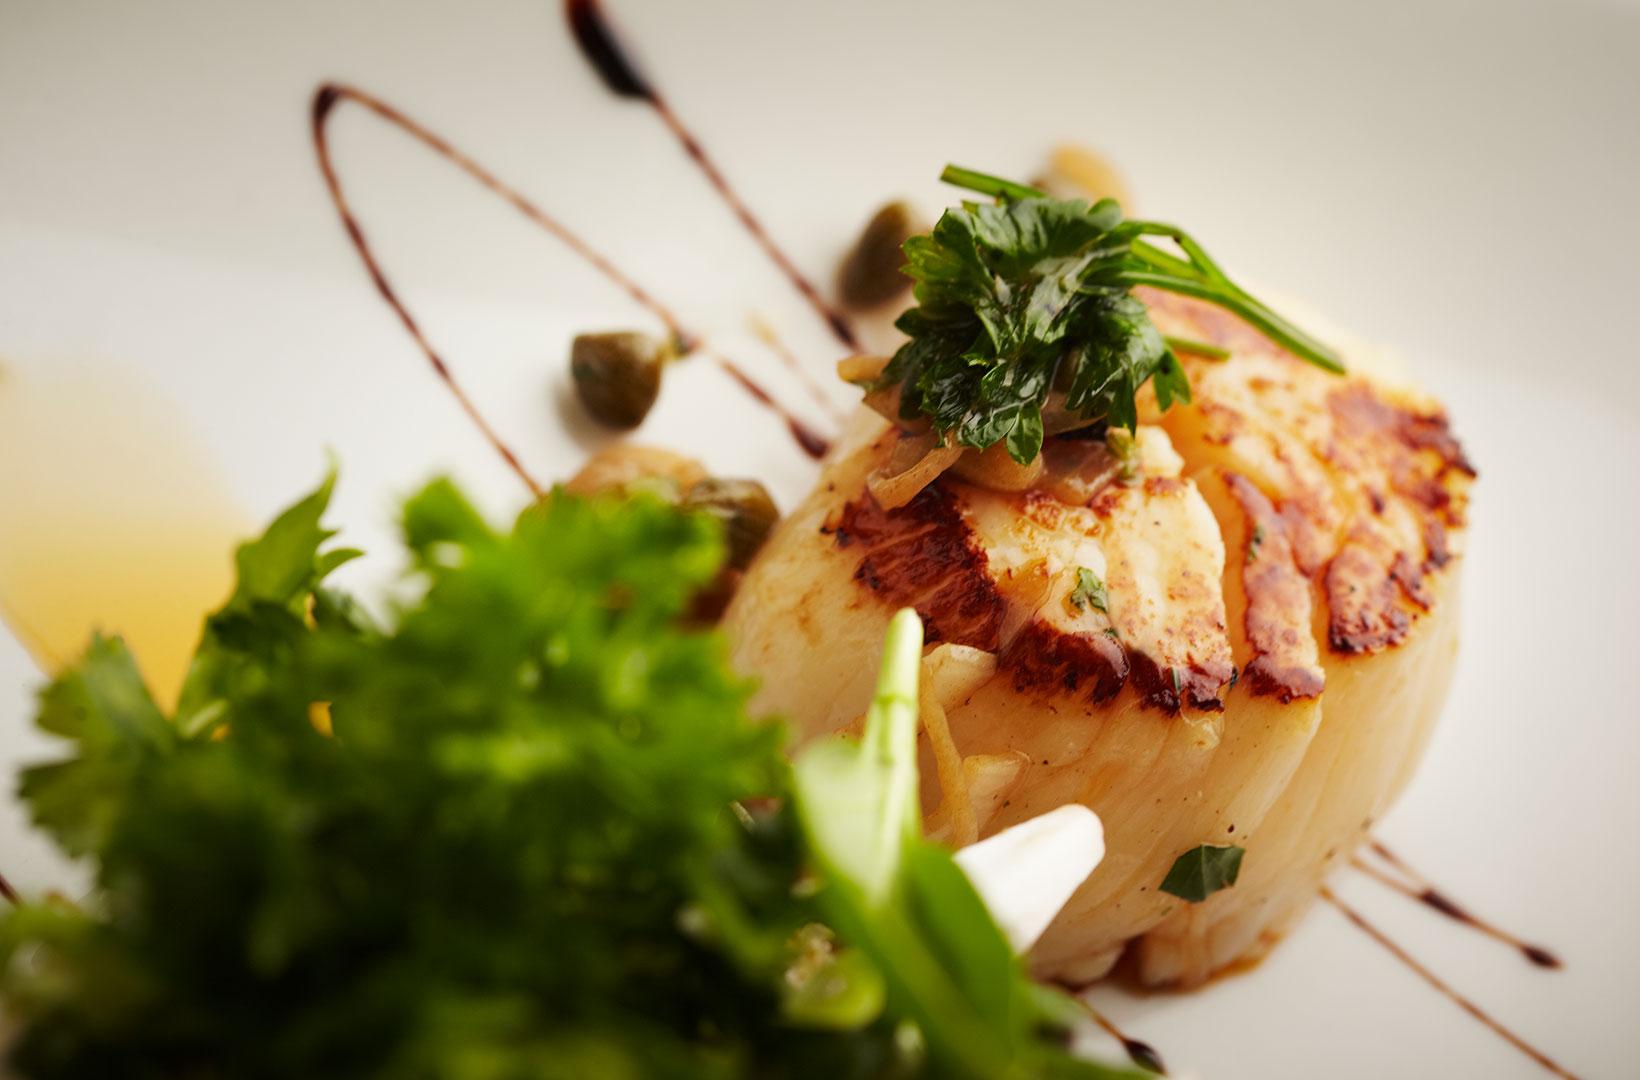 Dining_BG_02.jpg